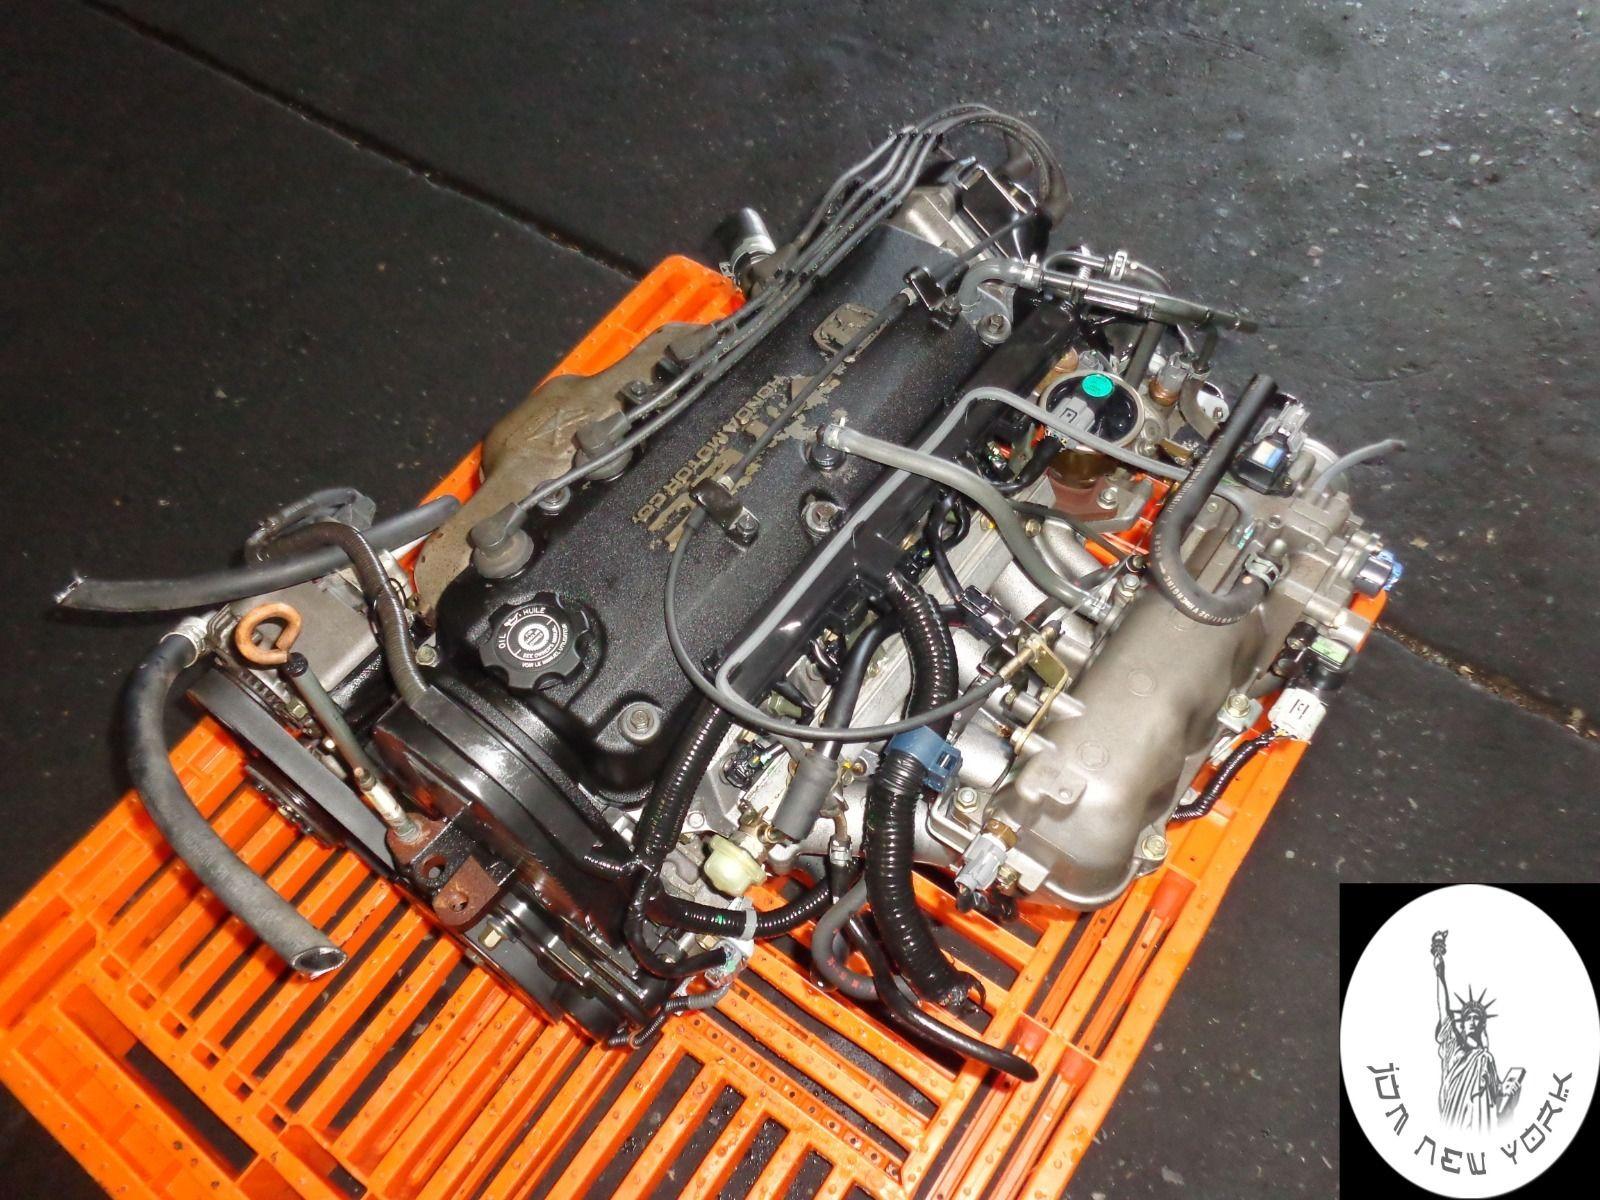 98 02 HONDA ACCORD 98 99 ACURA CL 98 ODYSSEY 2.3L SOHC VTEC ENGINE JDM F23A - JDM New York